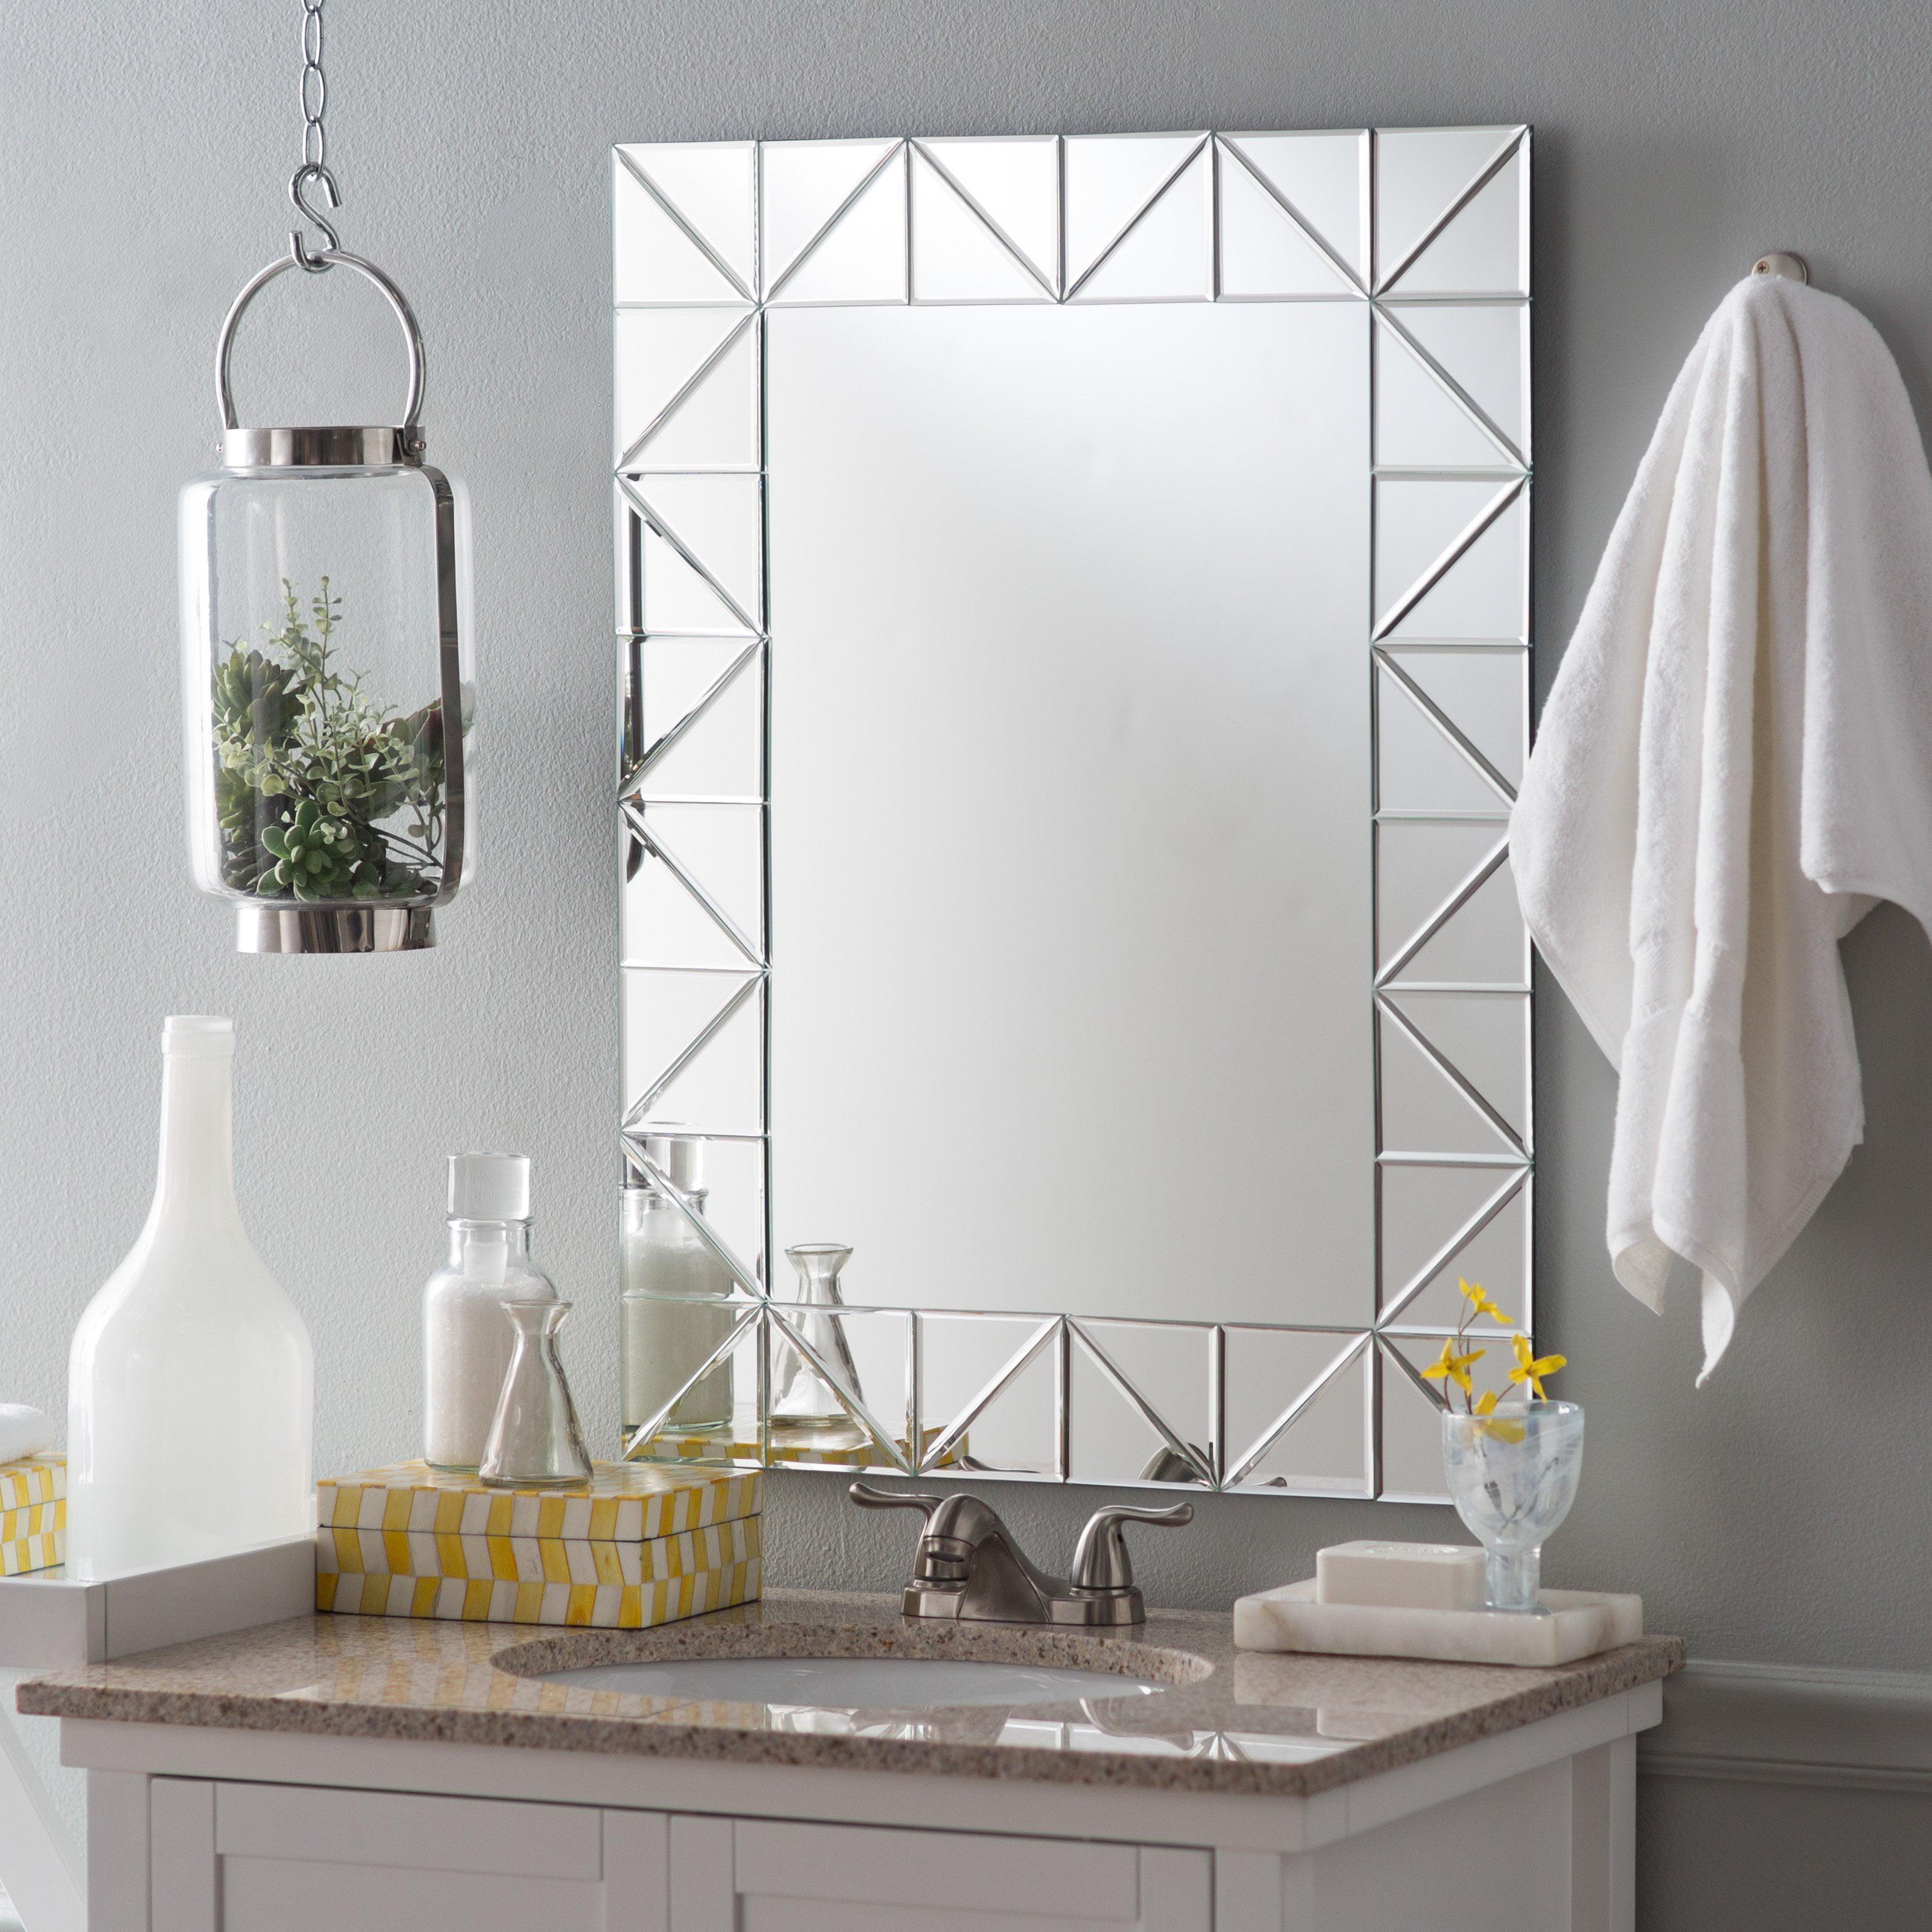 Decor Wonderland Miami Modern Bathroom Mirror 23.6W x 31.5H in. by